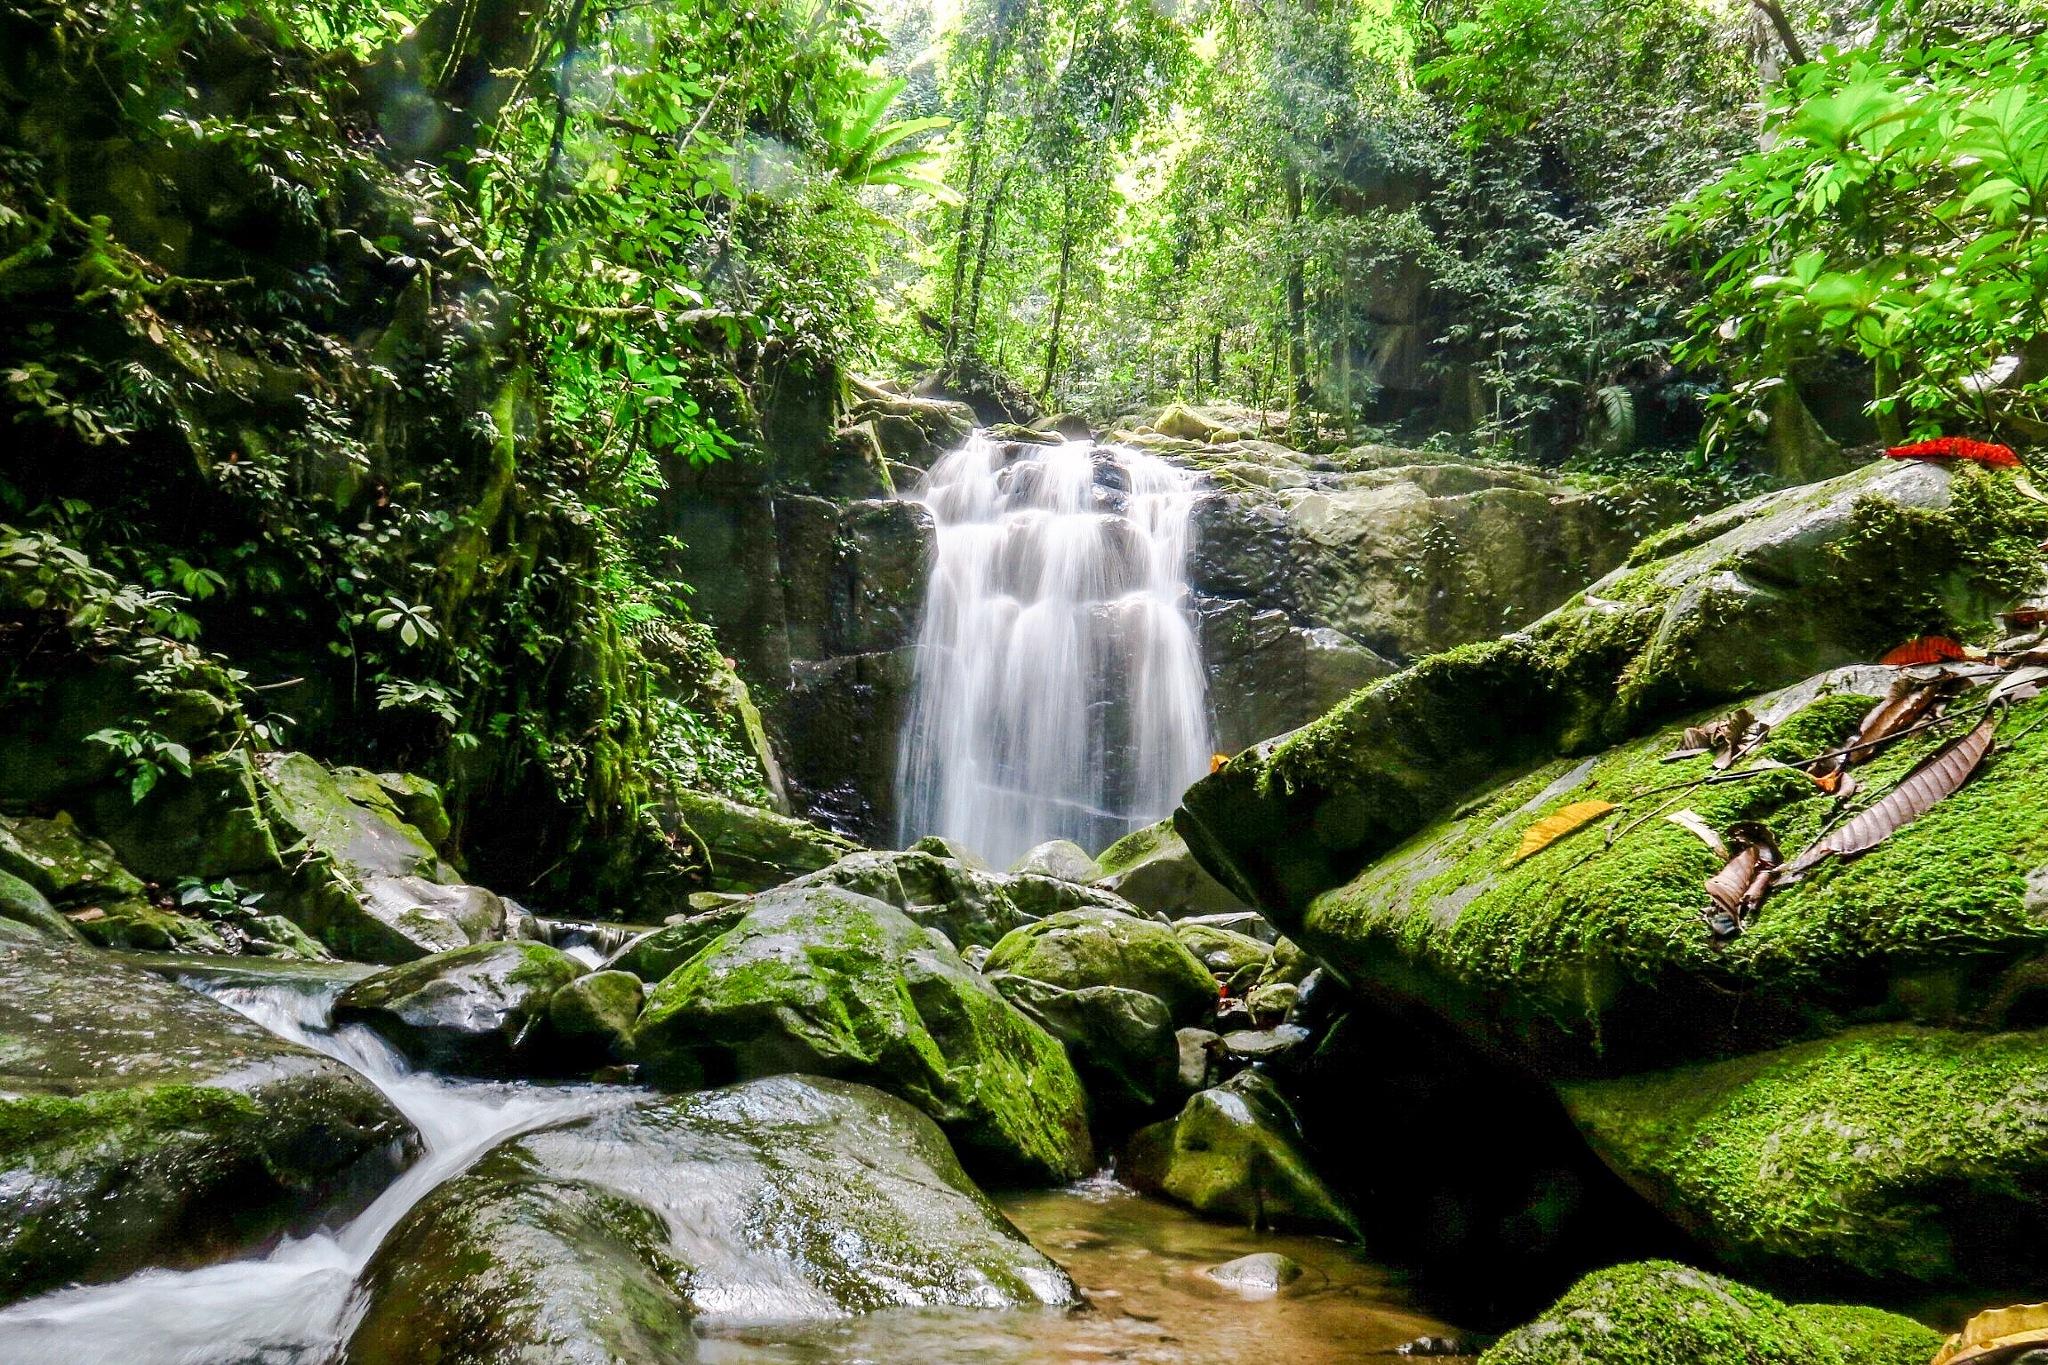 The hidden fall-Kionsom,Borneo by Adi Gli